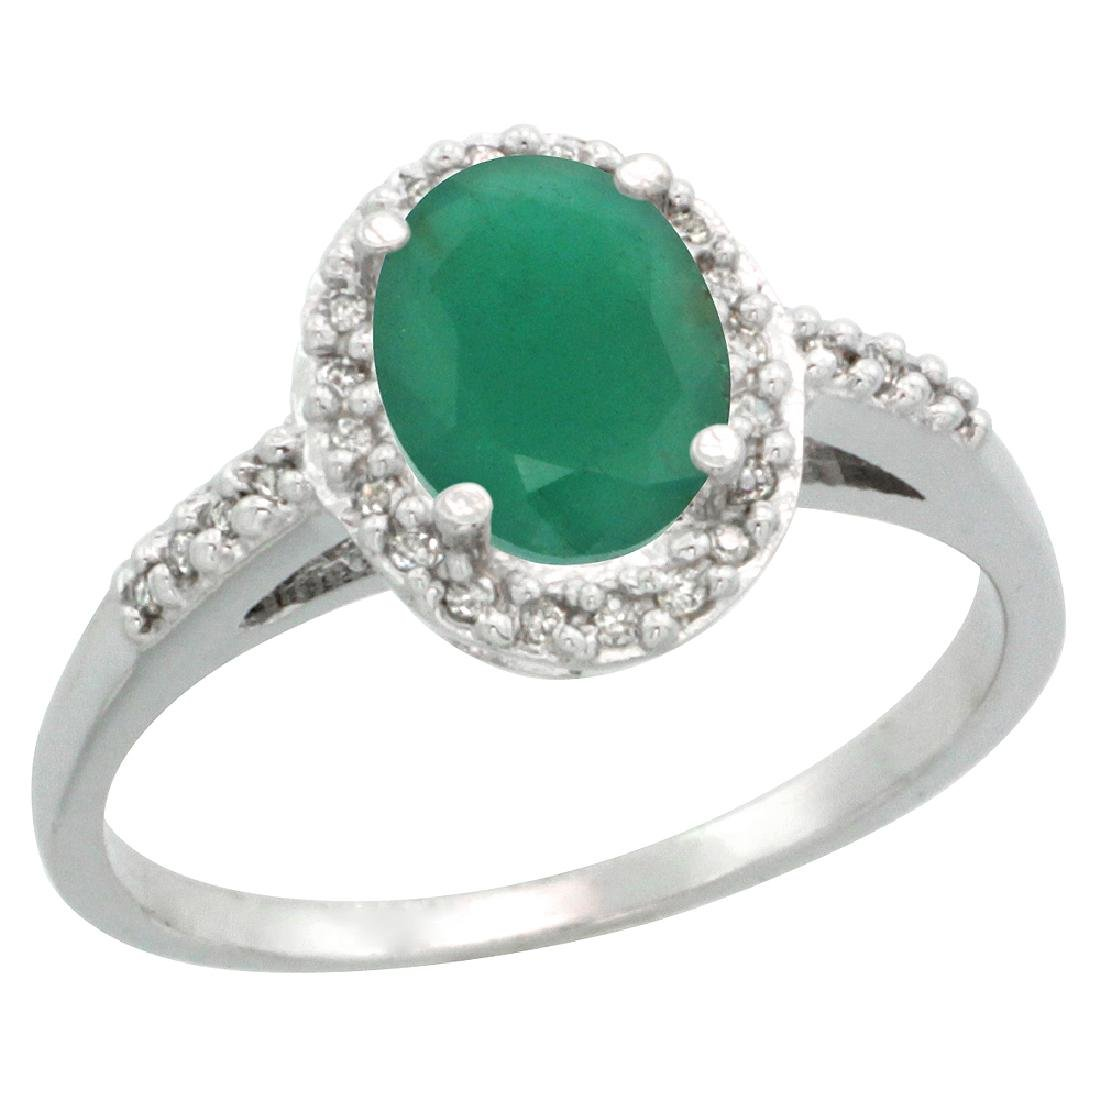 Natural 1.6 ctw Emerald & Diamond Engagement Ring 14K